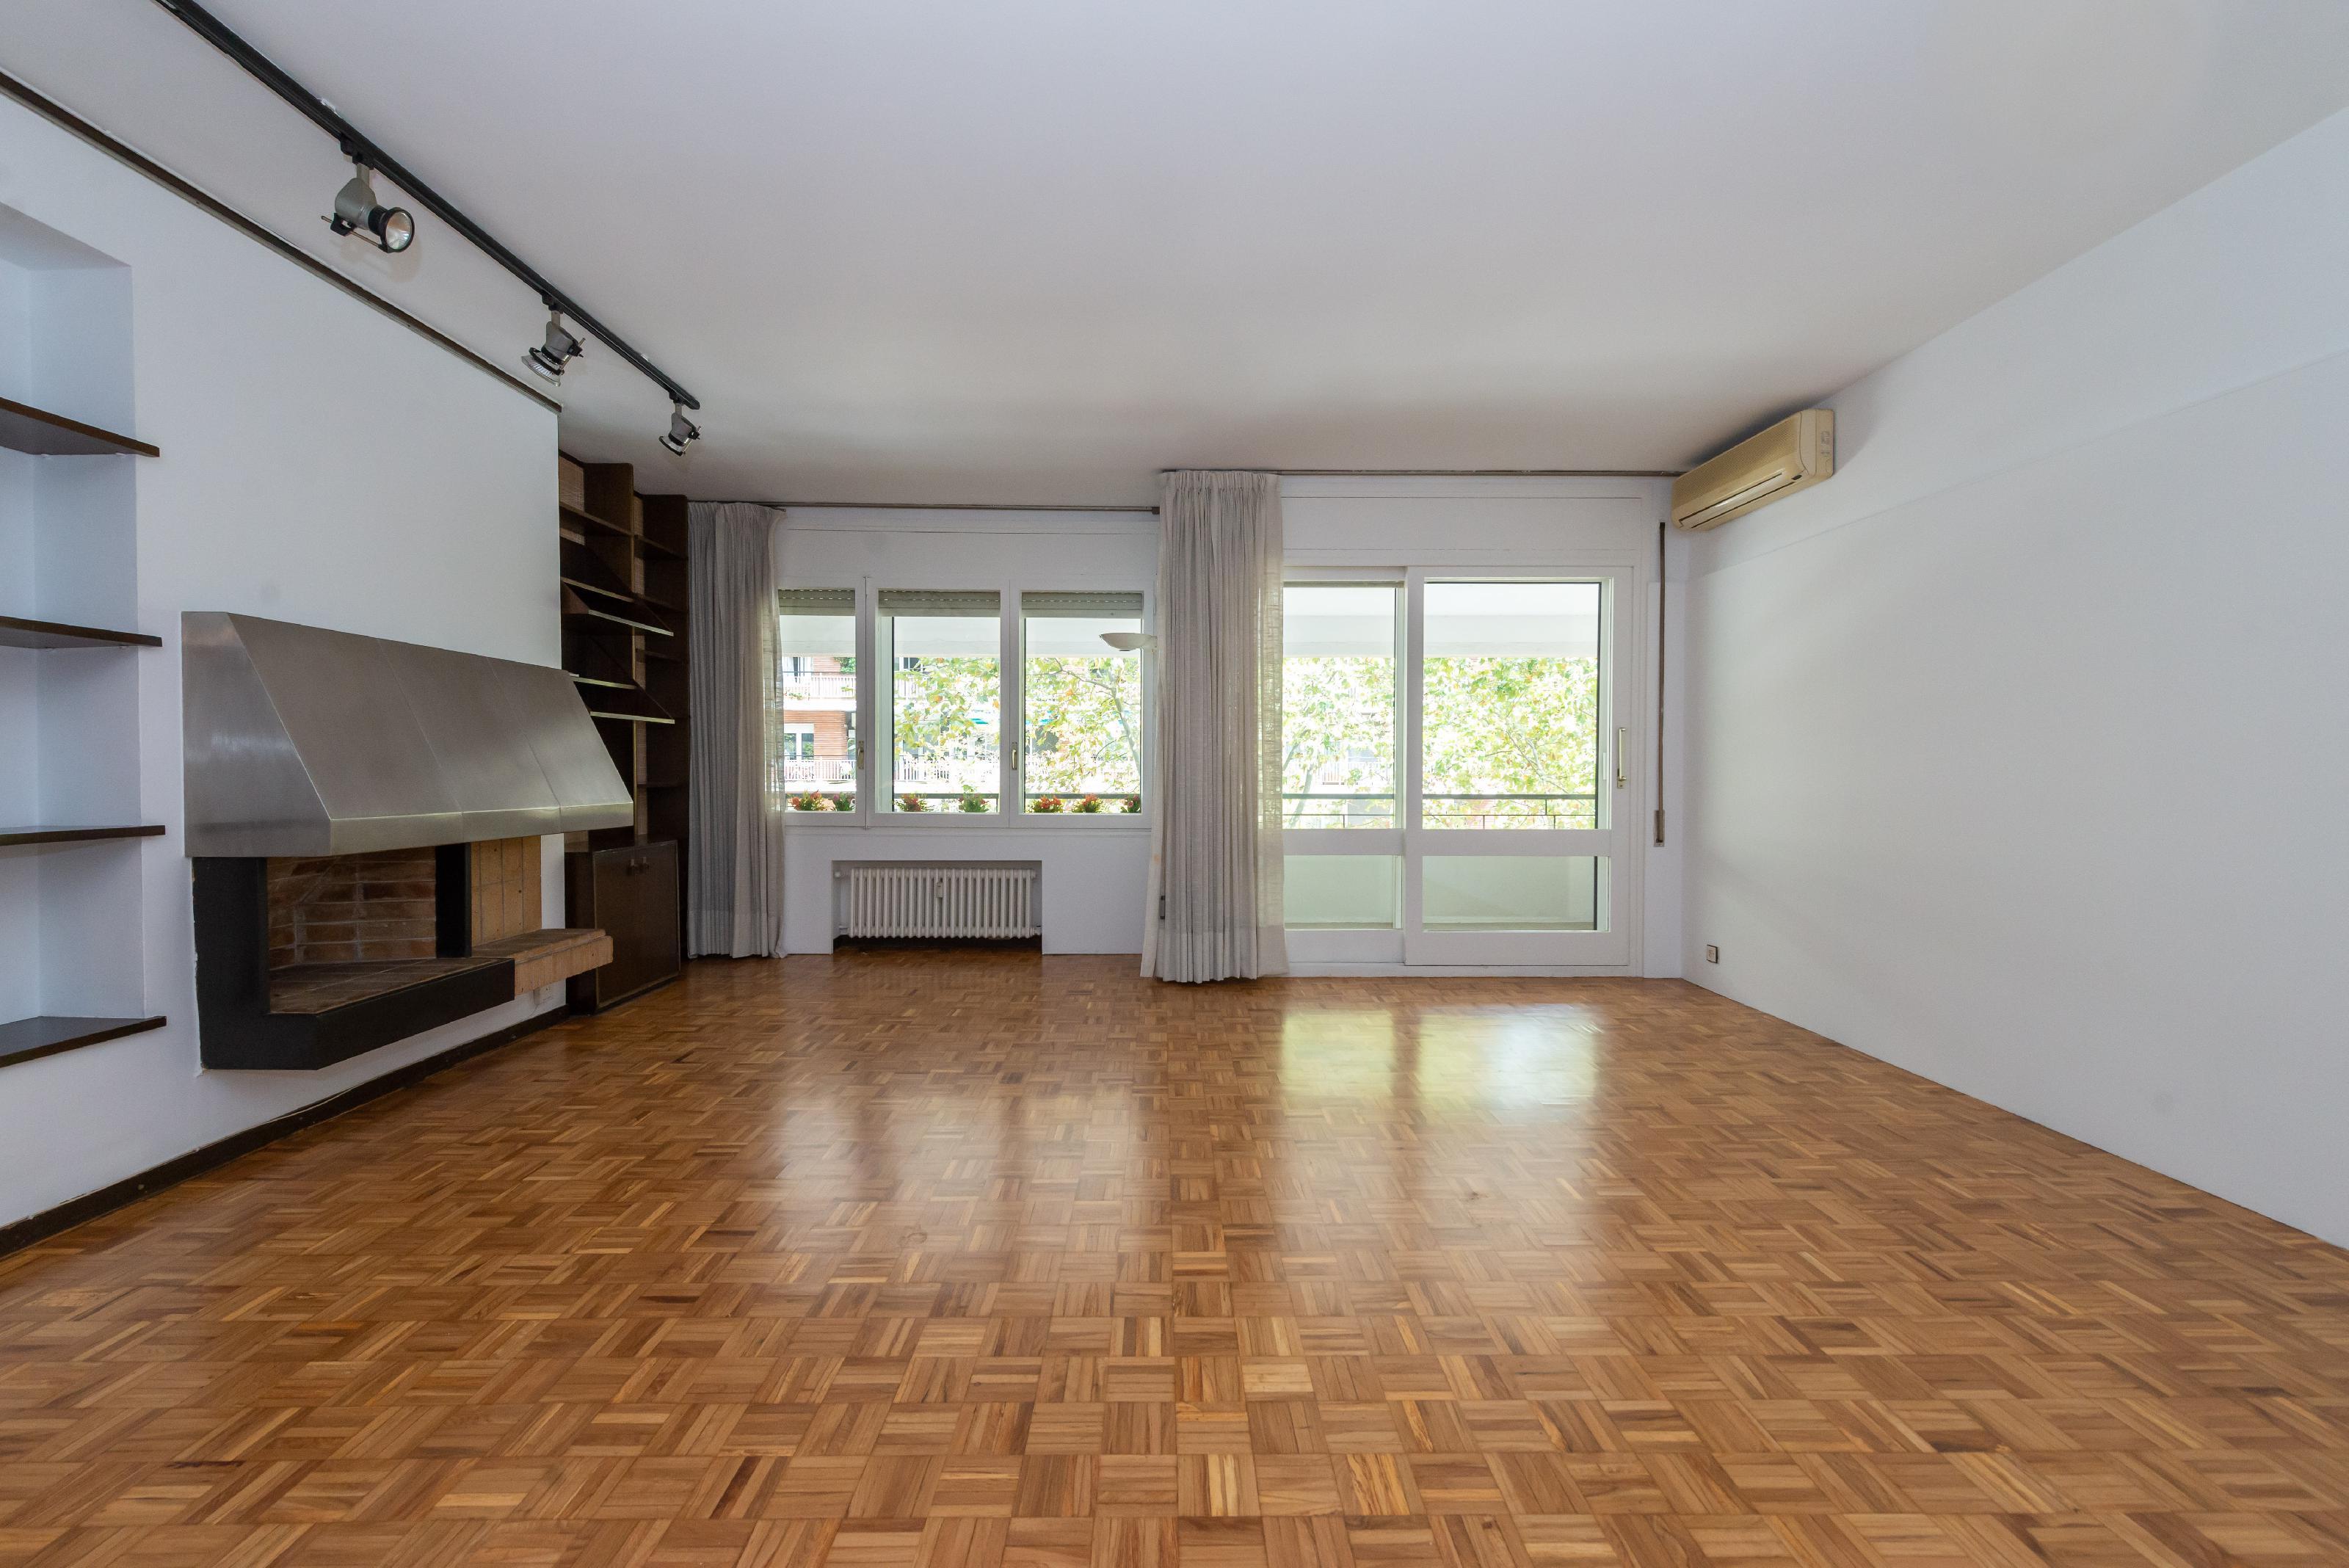 253470 Flat for sale in Sarrià-Sant Gervasi, El Putxet and Farró 11